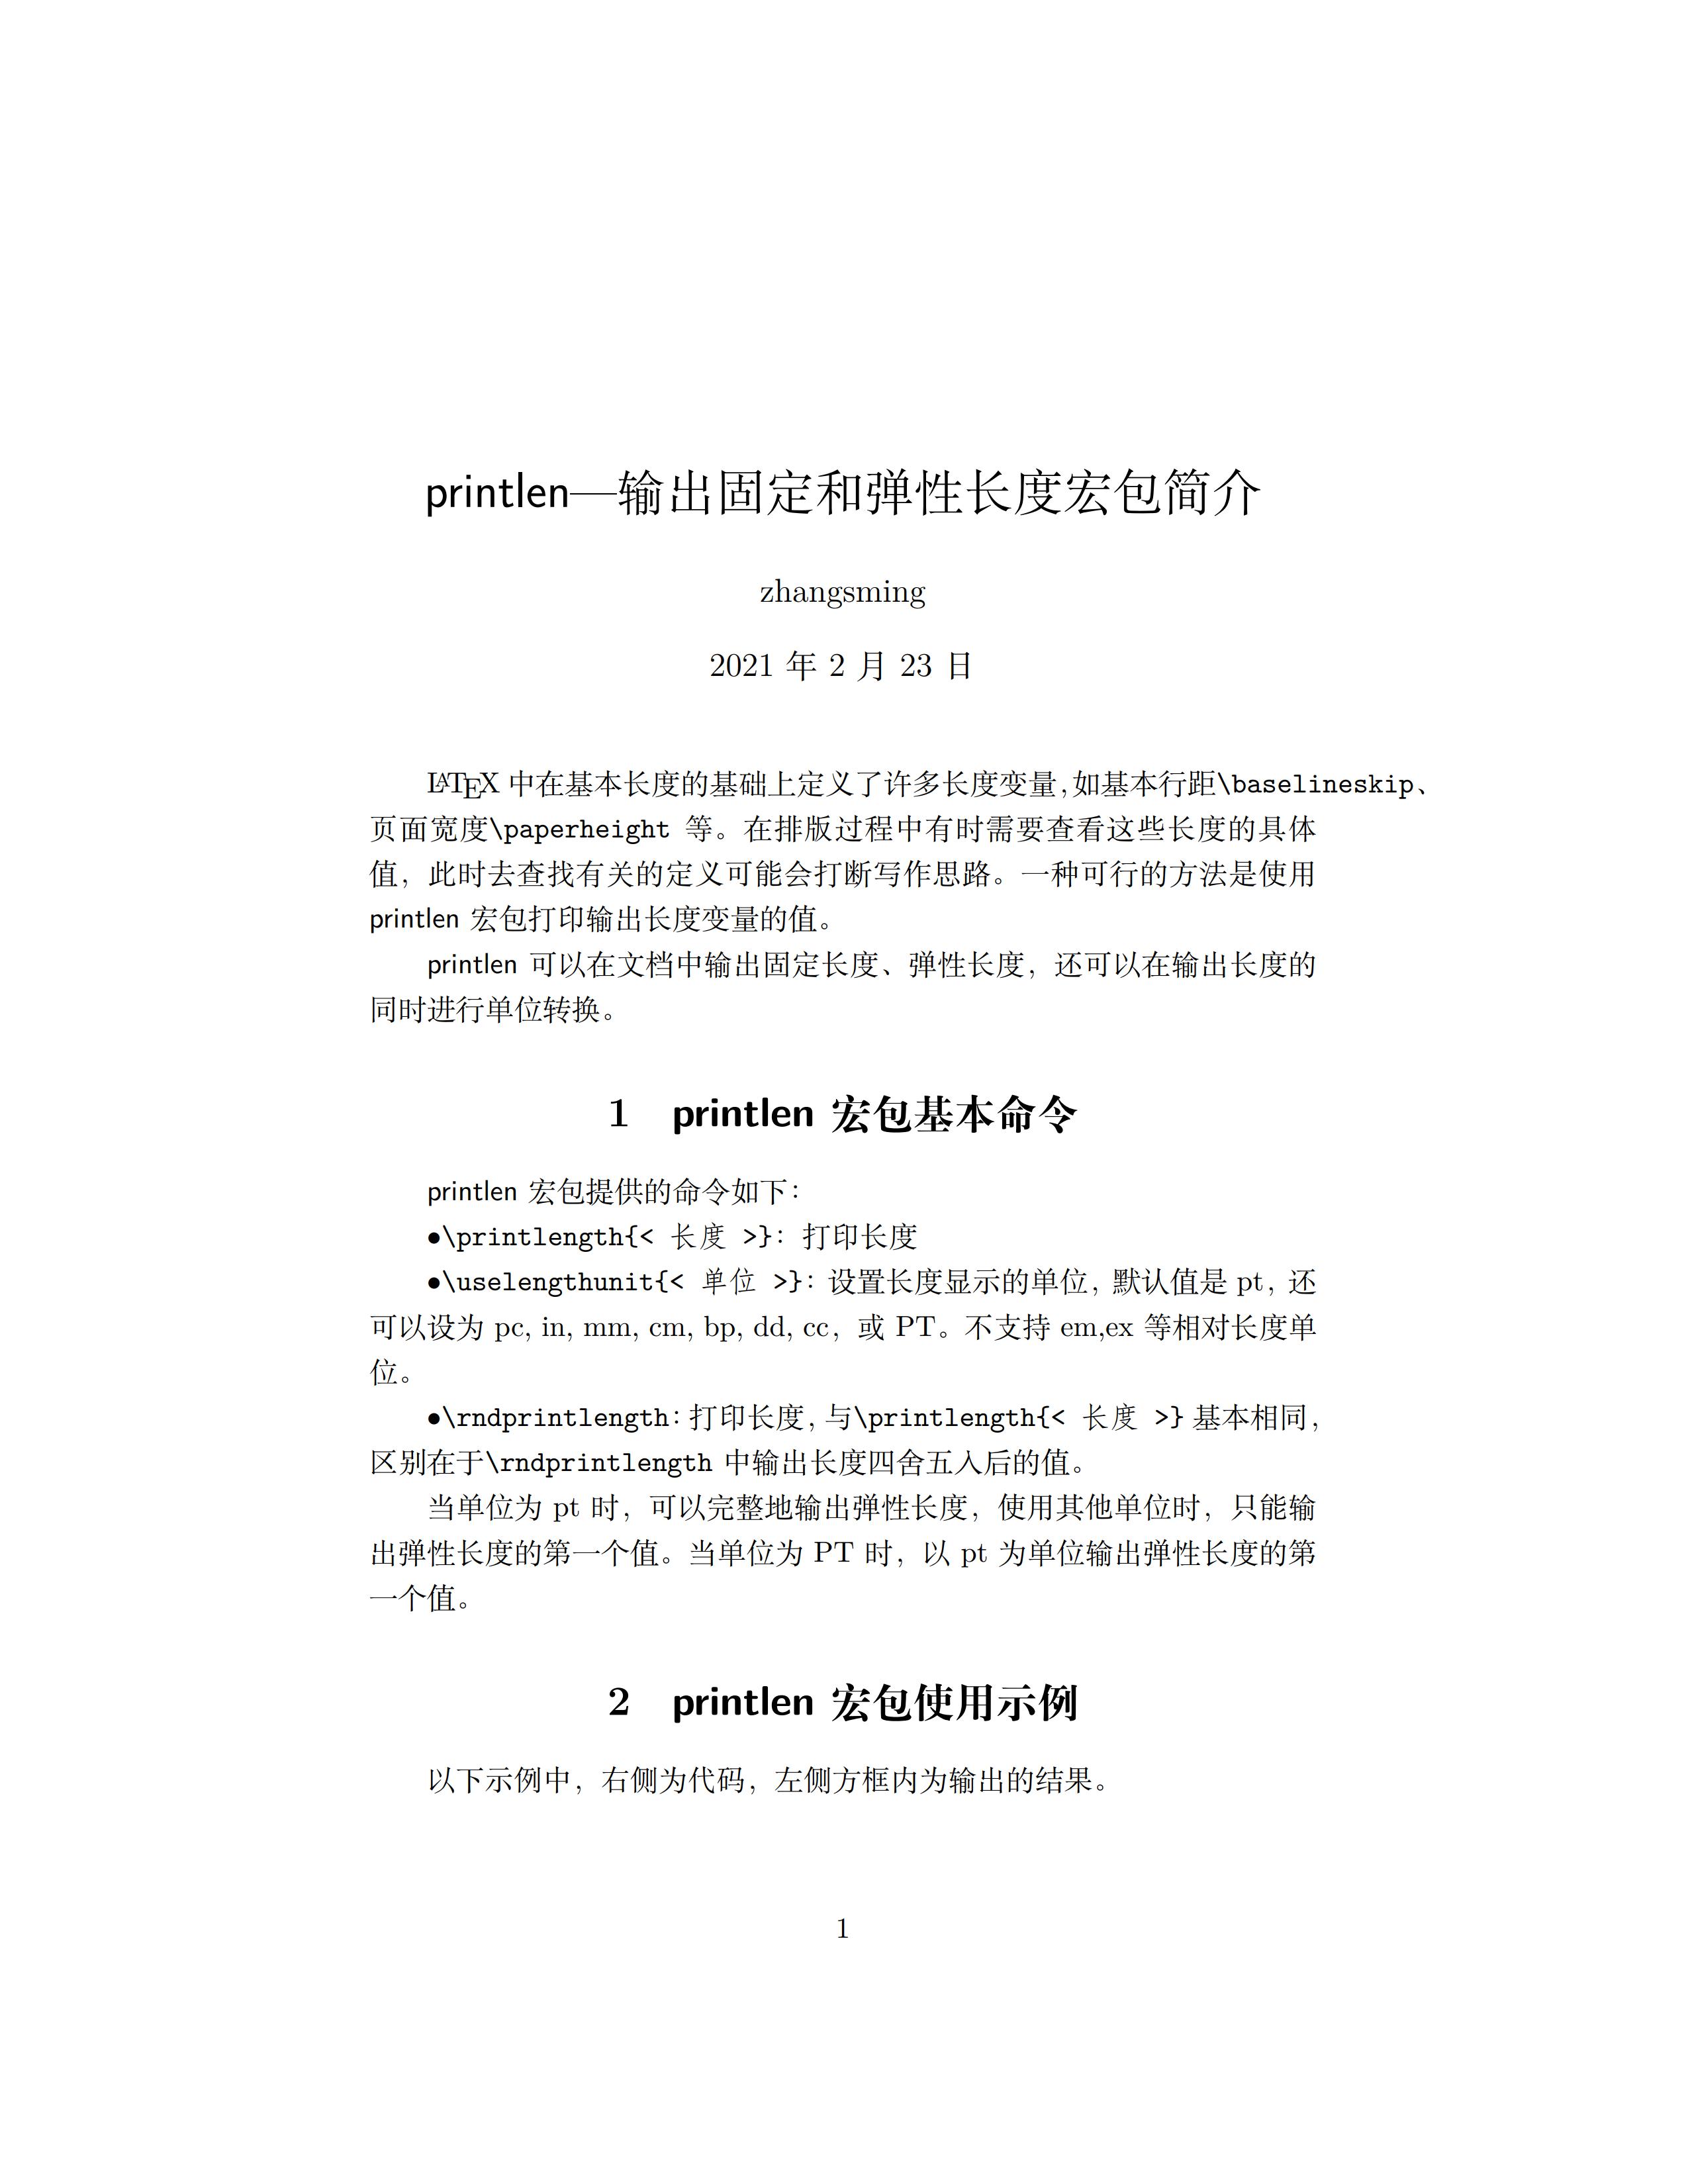 printlen---输出固定和弹性长度宏包简介